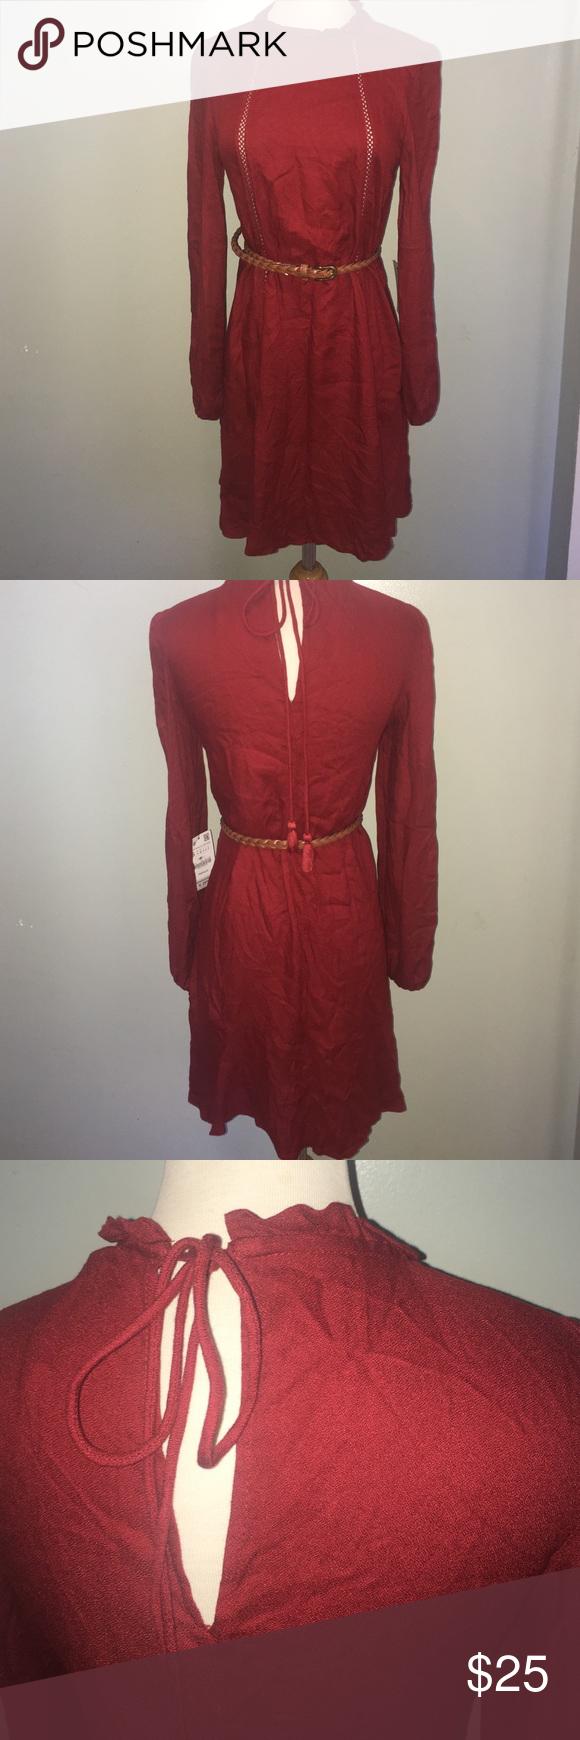 Zara burgundy dress another rich burgundy red dress never worn new